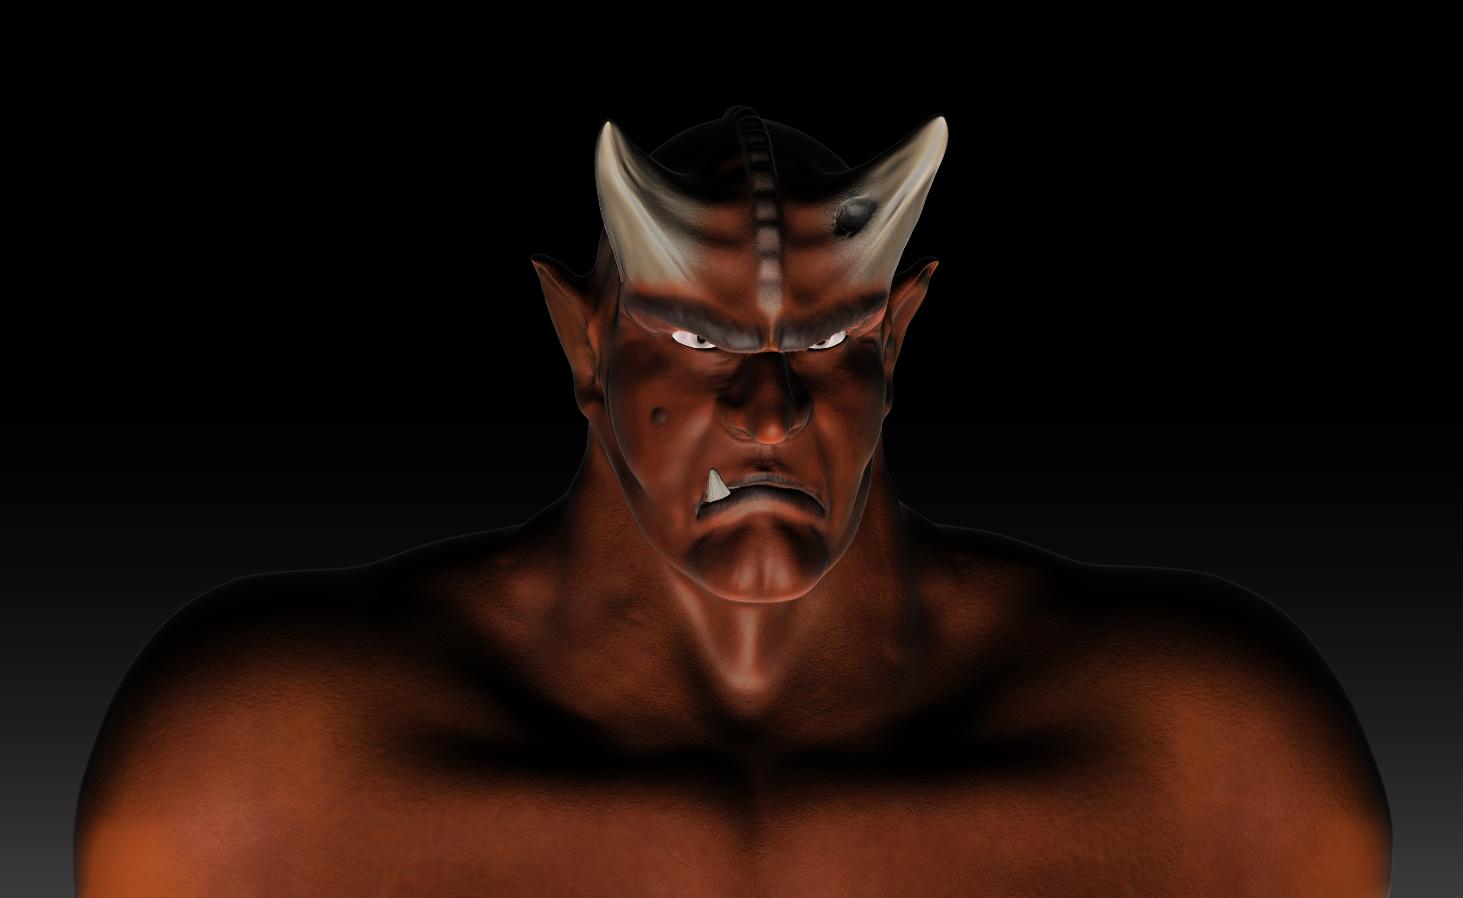 Demonios en 3D - Imagui